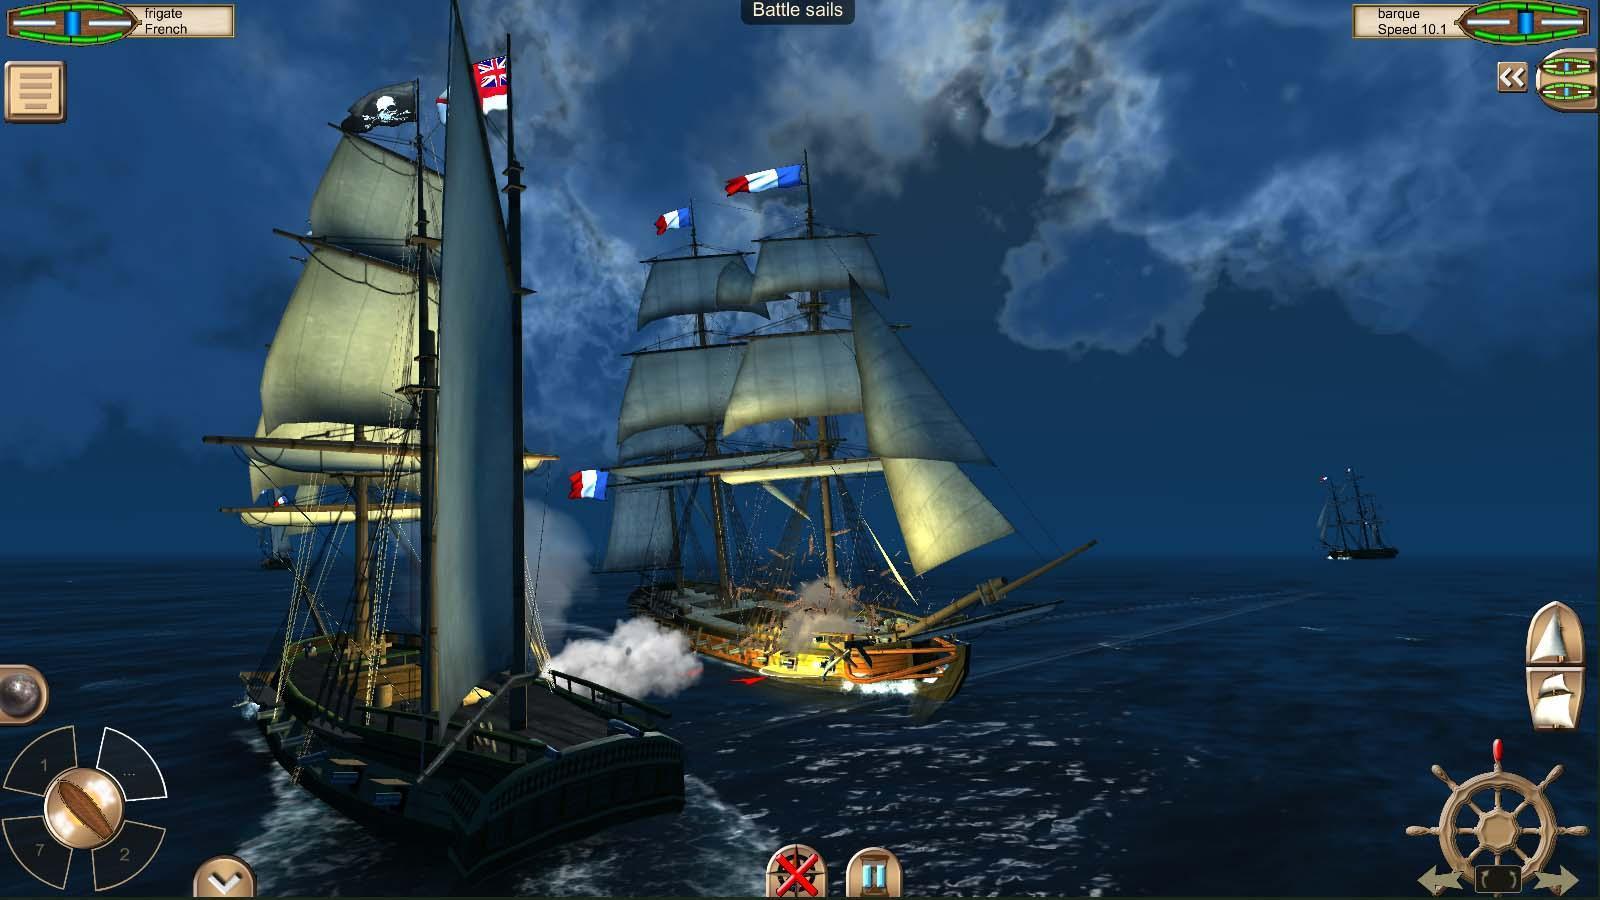 The Pirate: Caribbean Hunt 9.6 Screenshot 2